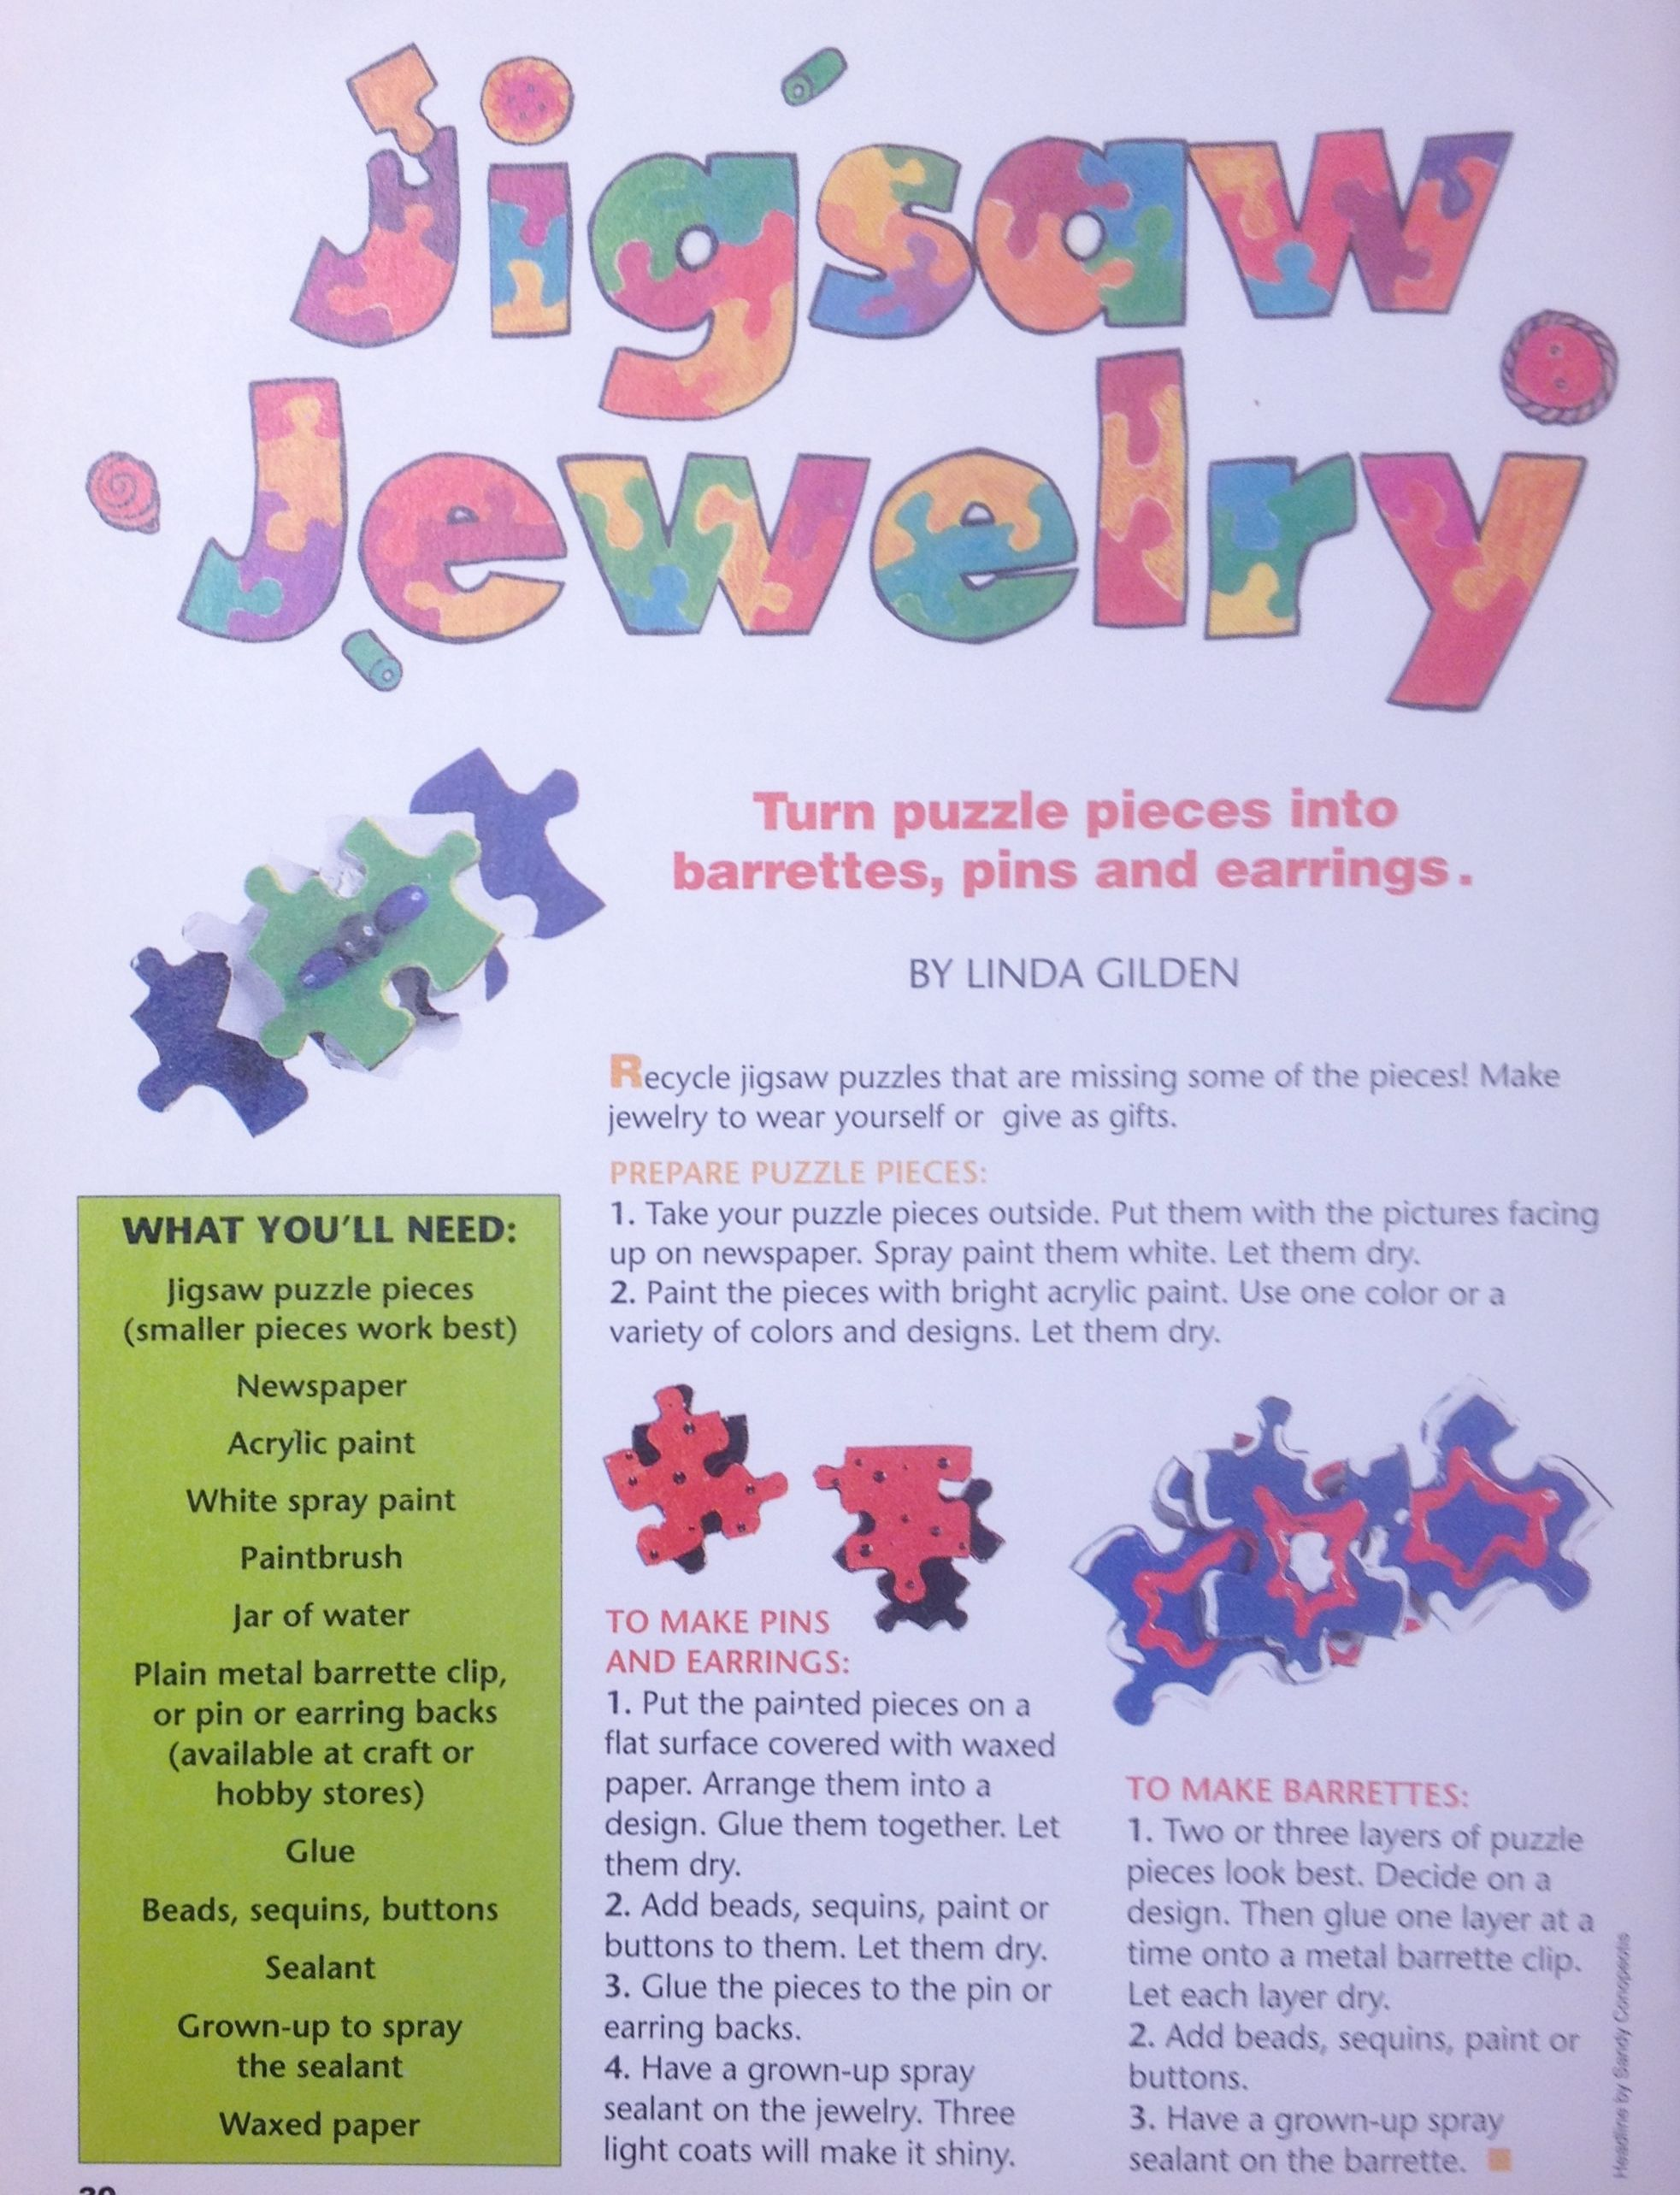 Jigsaw Jewelry Recycle Puzzle Pieces